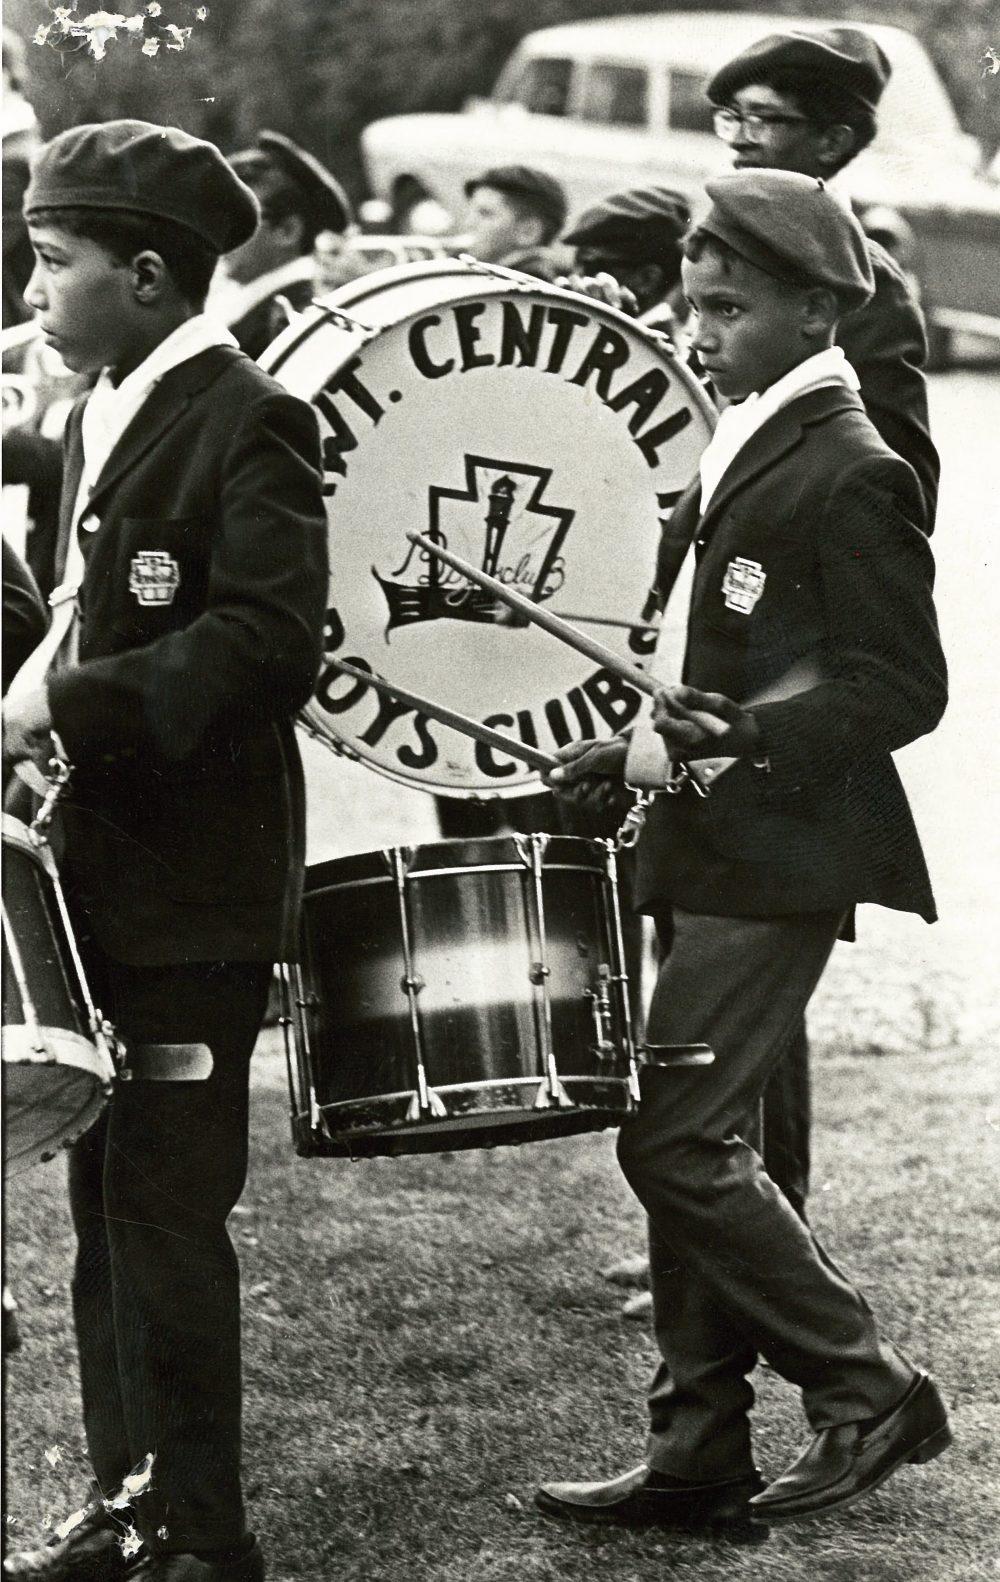 1970s band